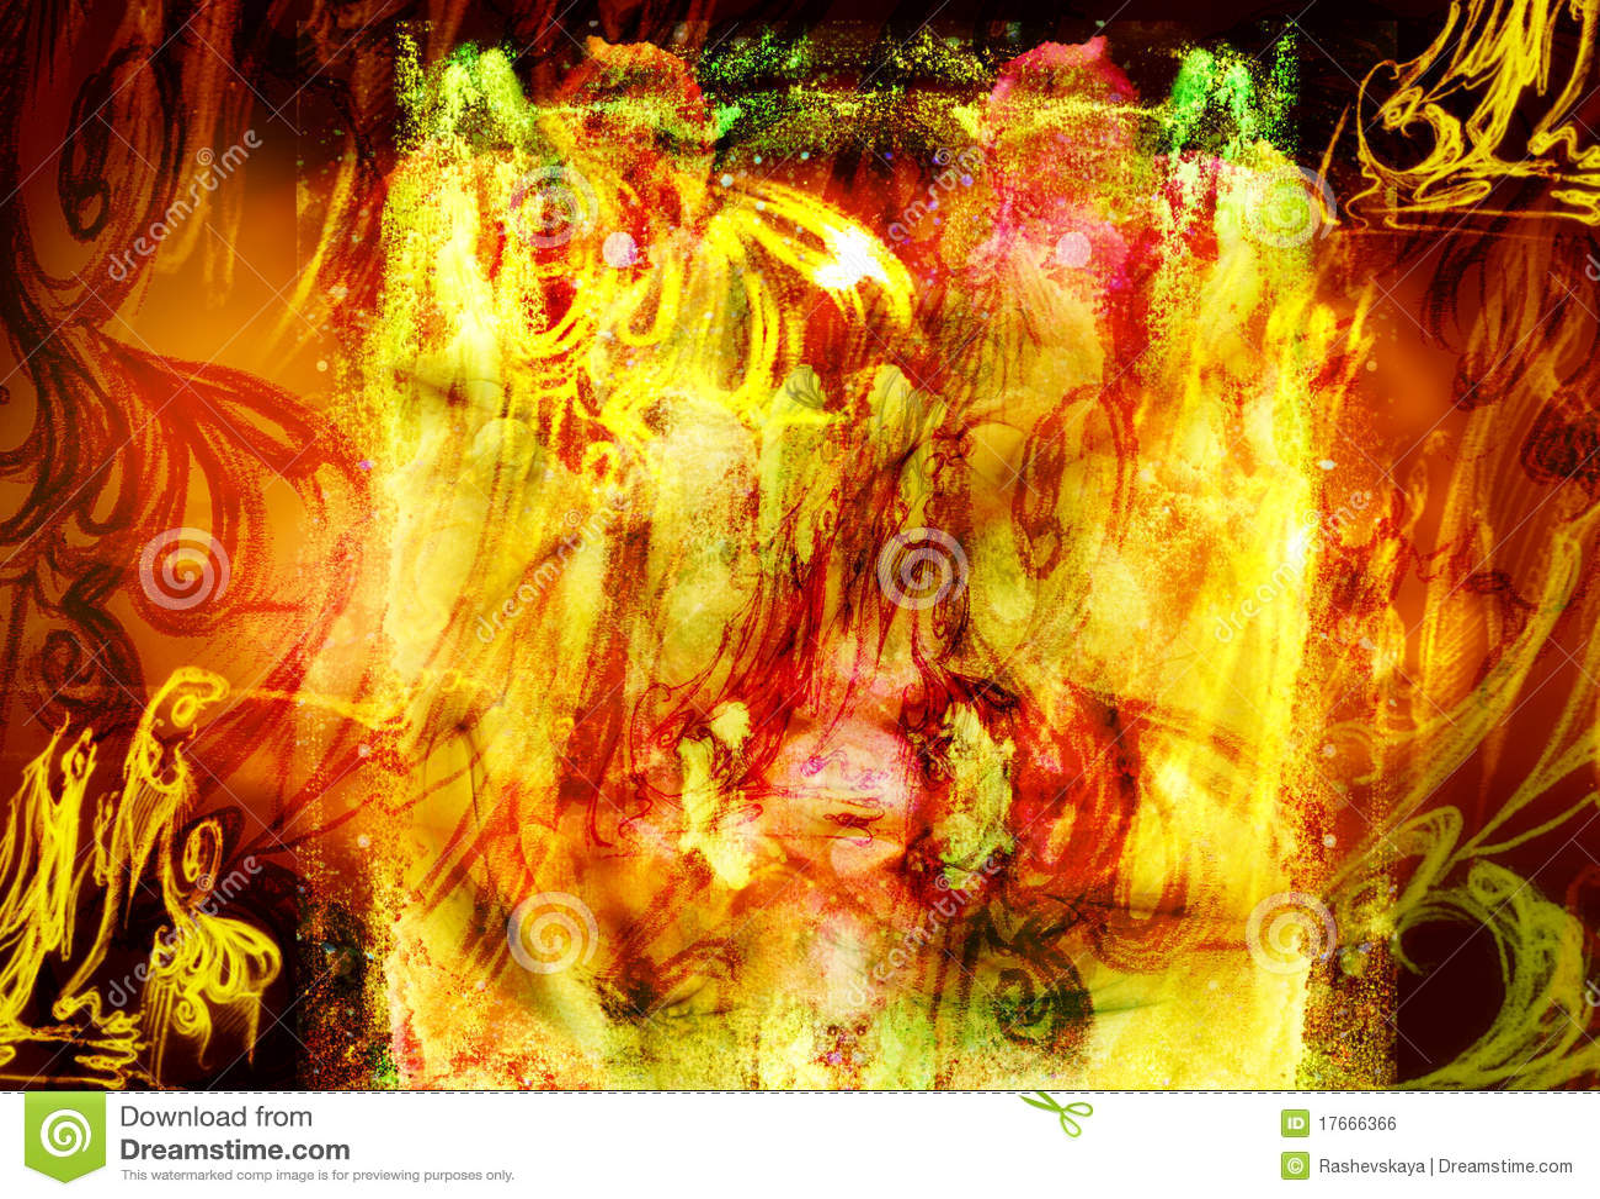 Fiery hellish background